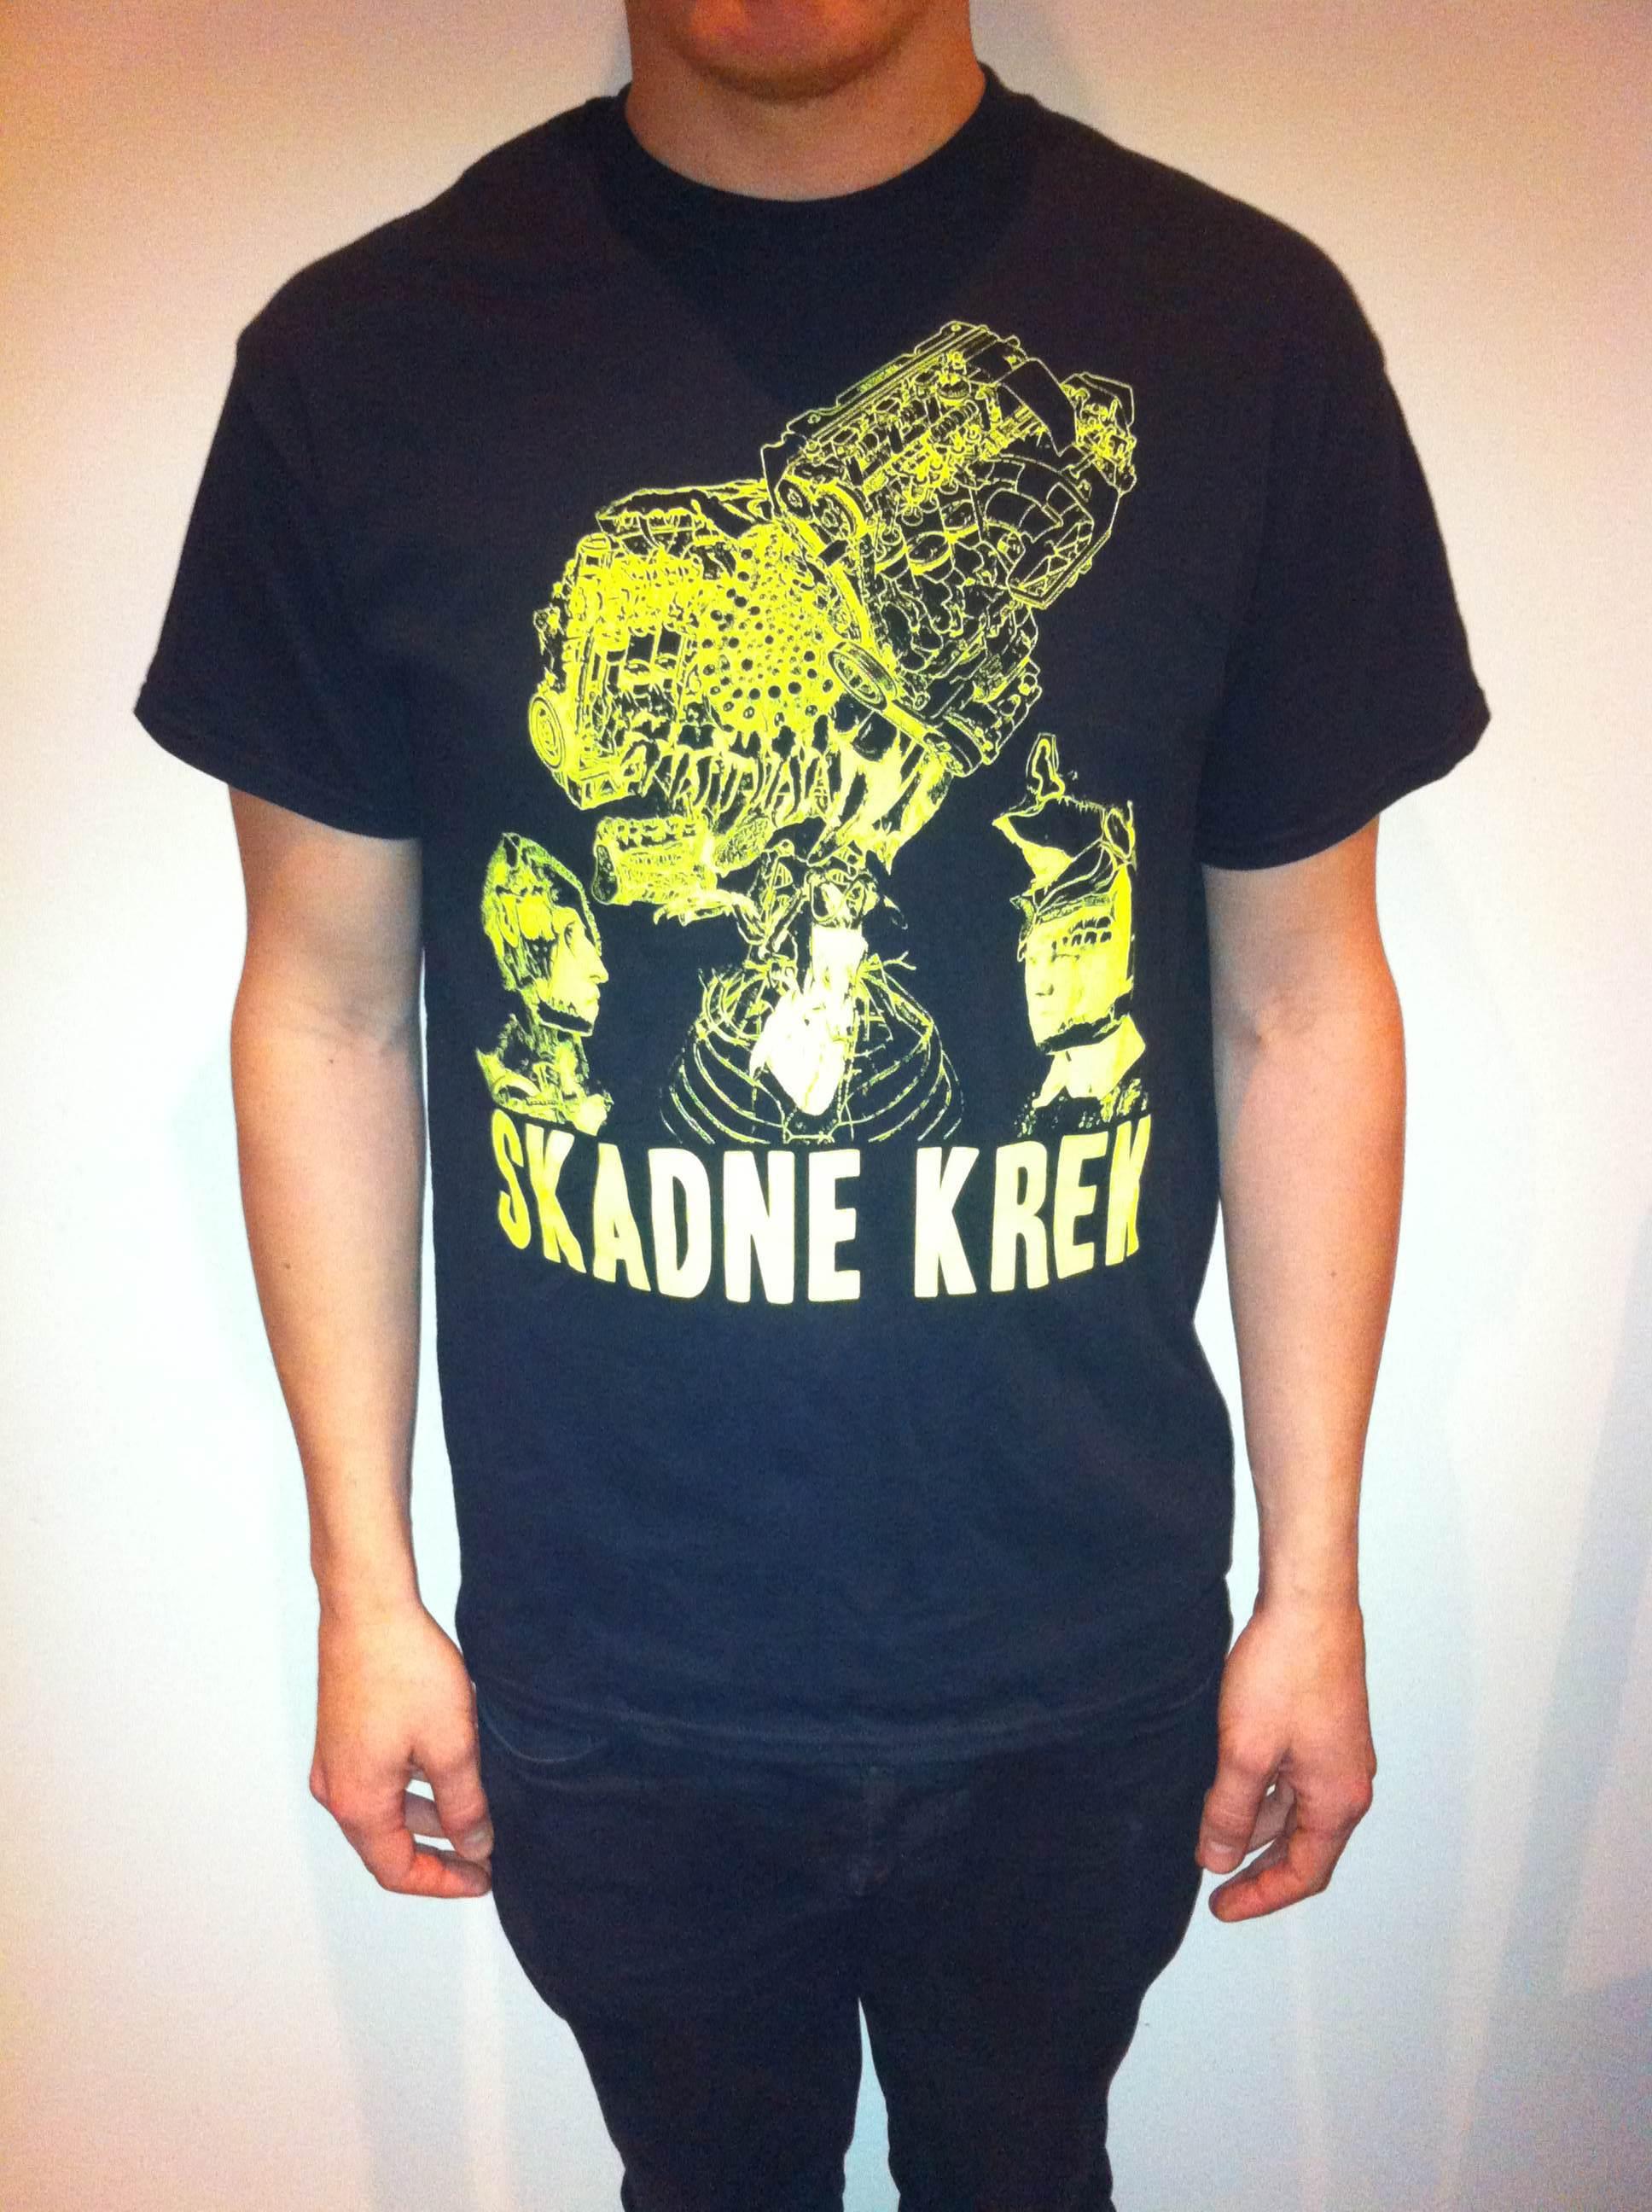 Skadne Krek tshirt  100 NOK/10€ + shipping  available colours: black, dark grey  sizes: S, M, L, XL